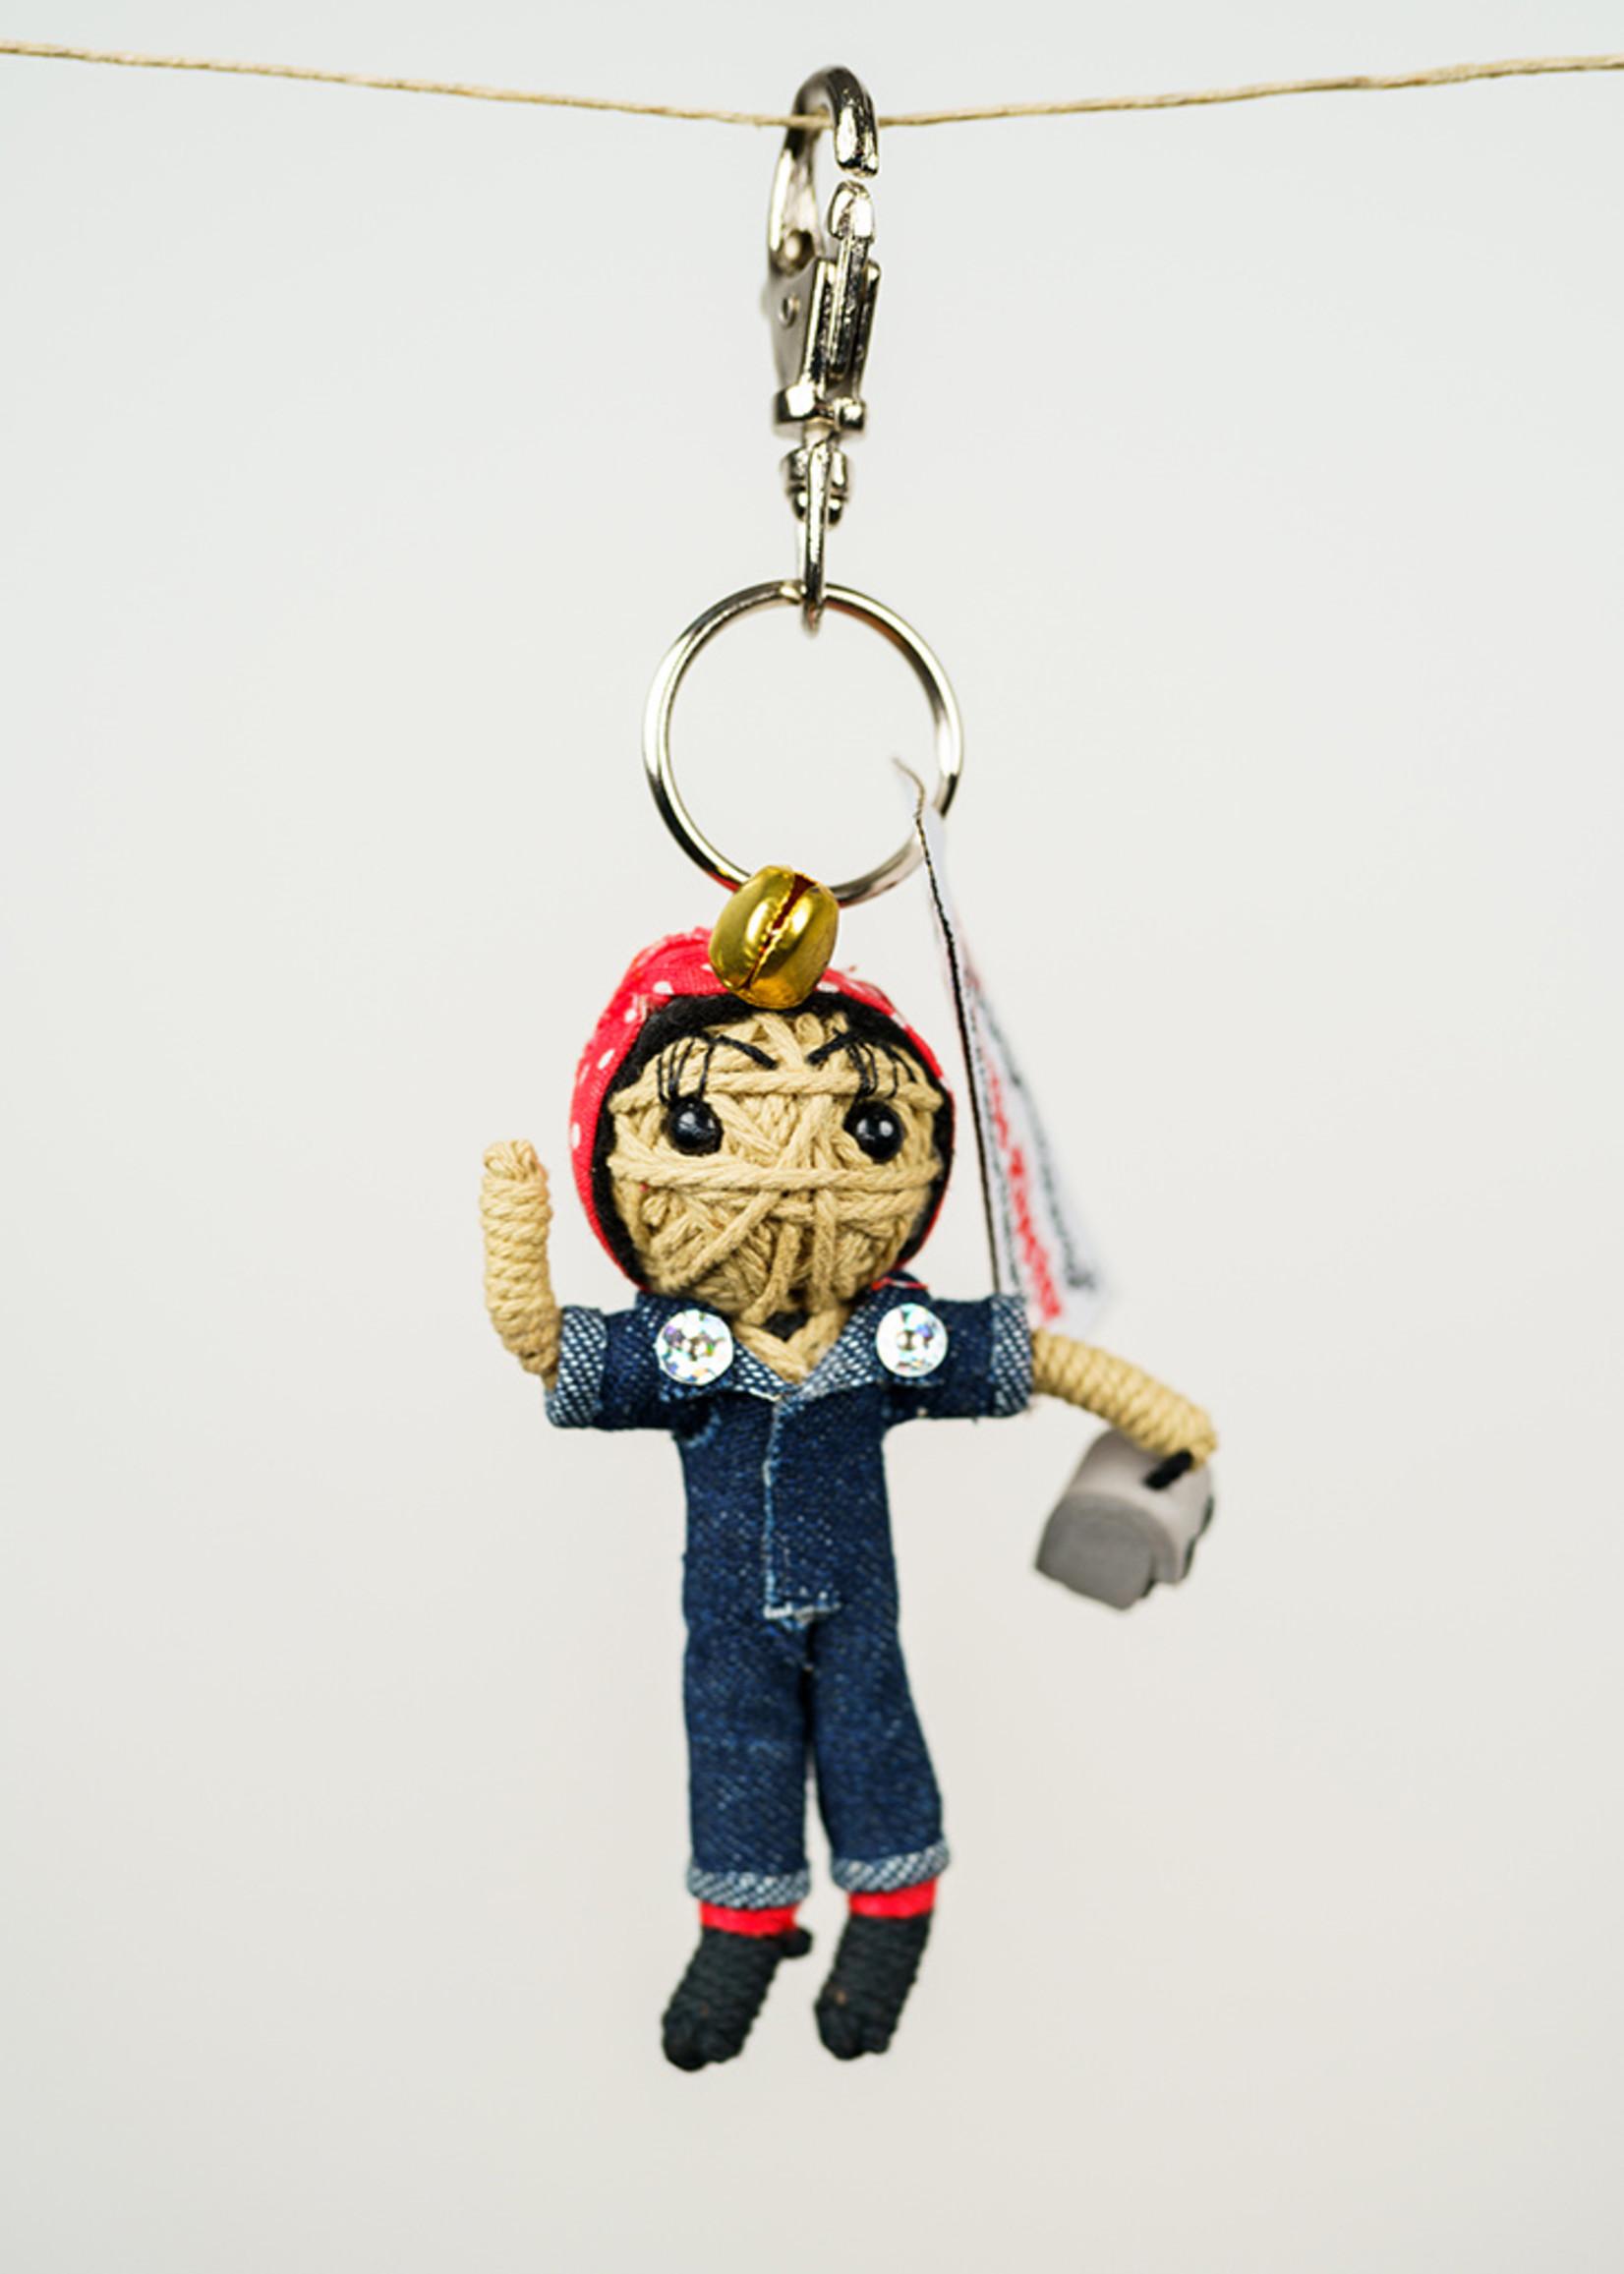 Rosie the Riveter String Doll